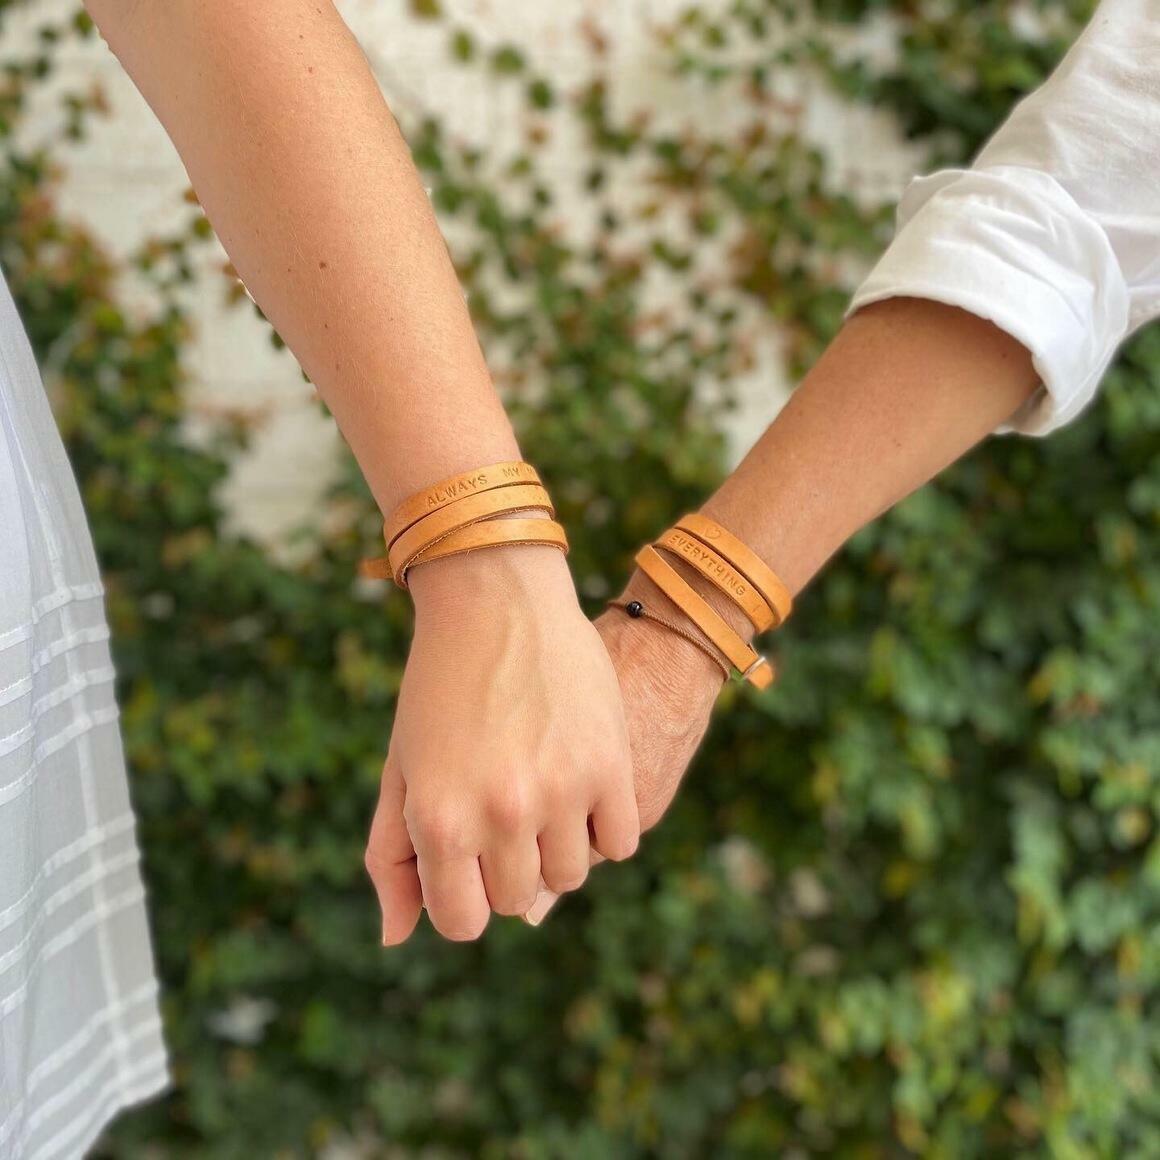 'WARRIOR' - Power Of Words Leather Bracelet - Tan | Trada Marketplace